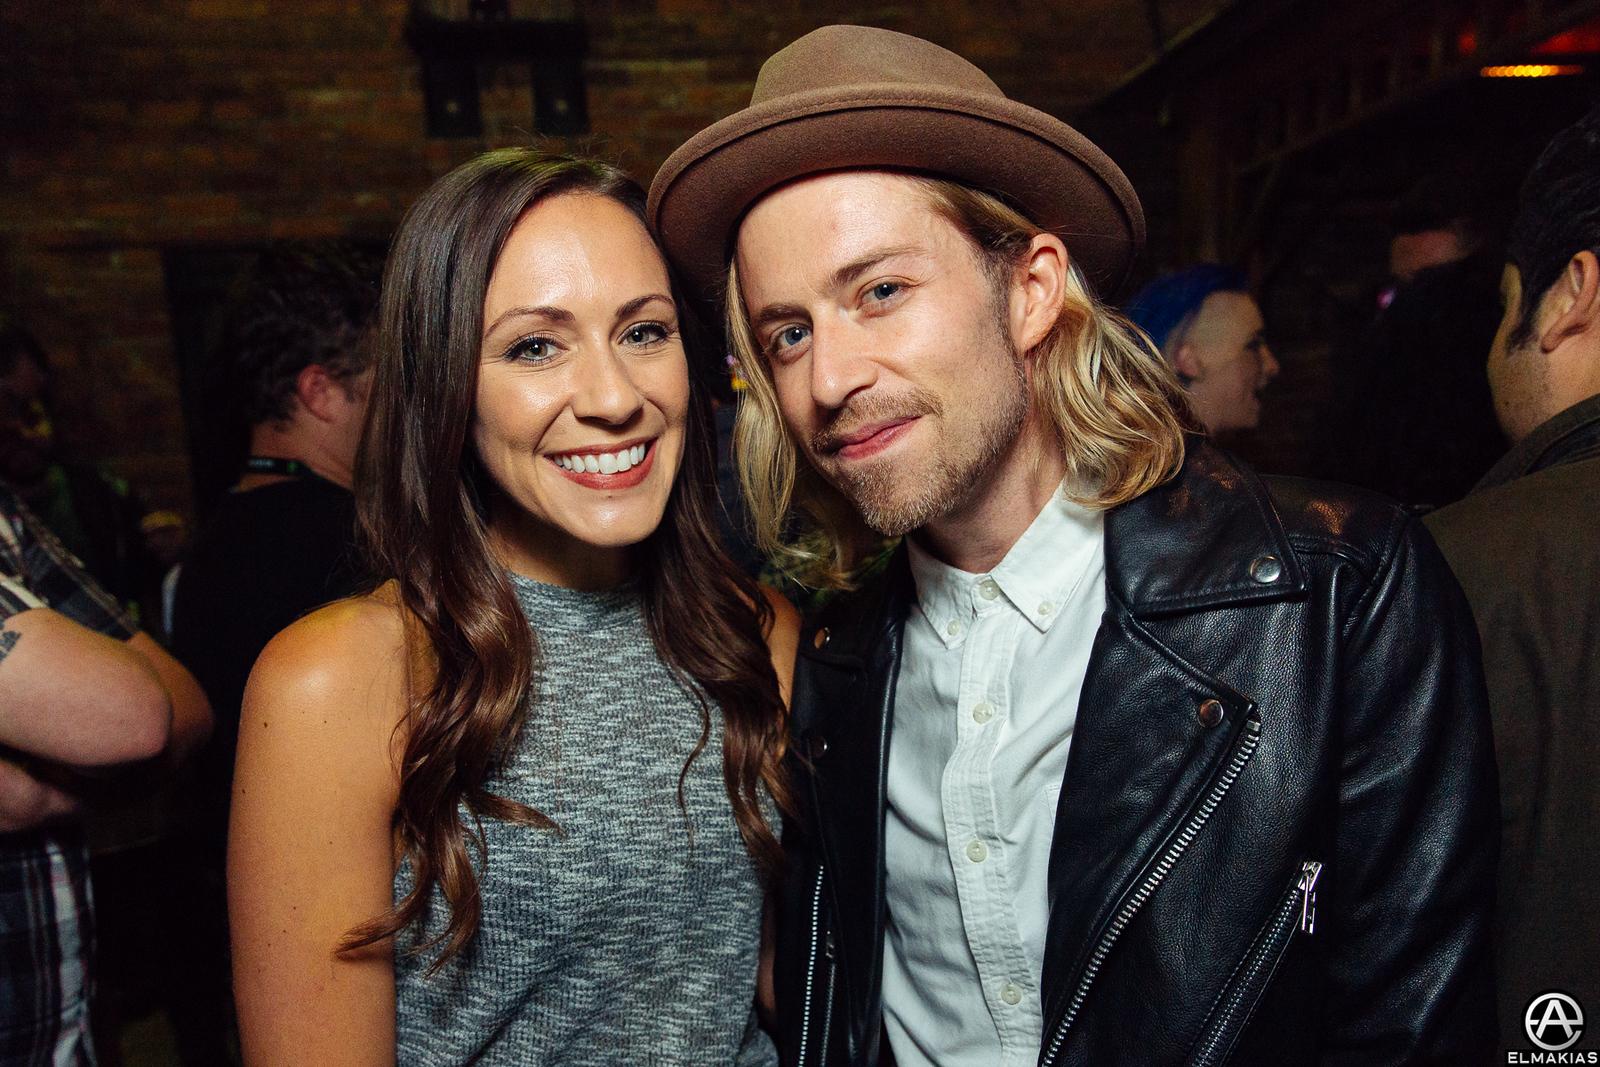 Tara and Bryce Avary of The Rocket Summer at the 2015 APMAs by Adam Elmakias